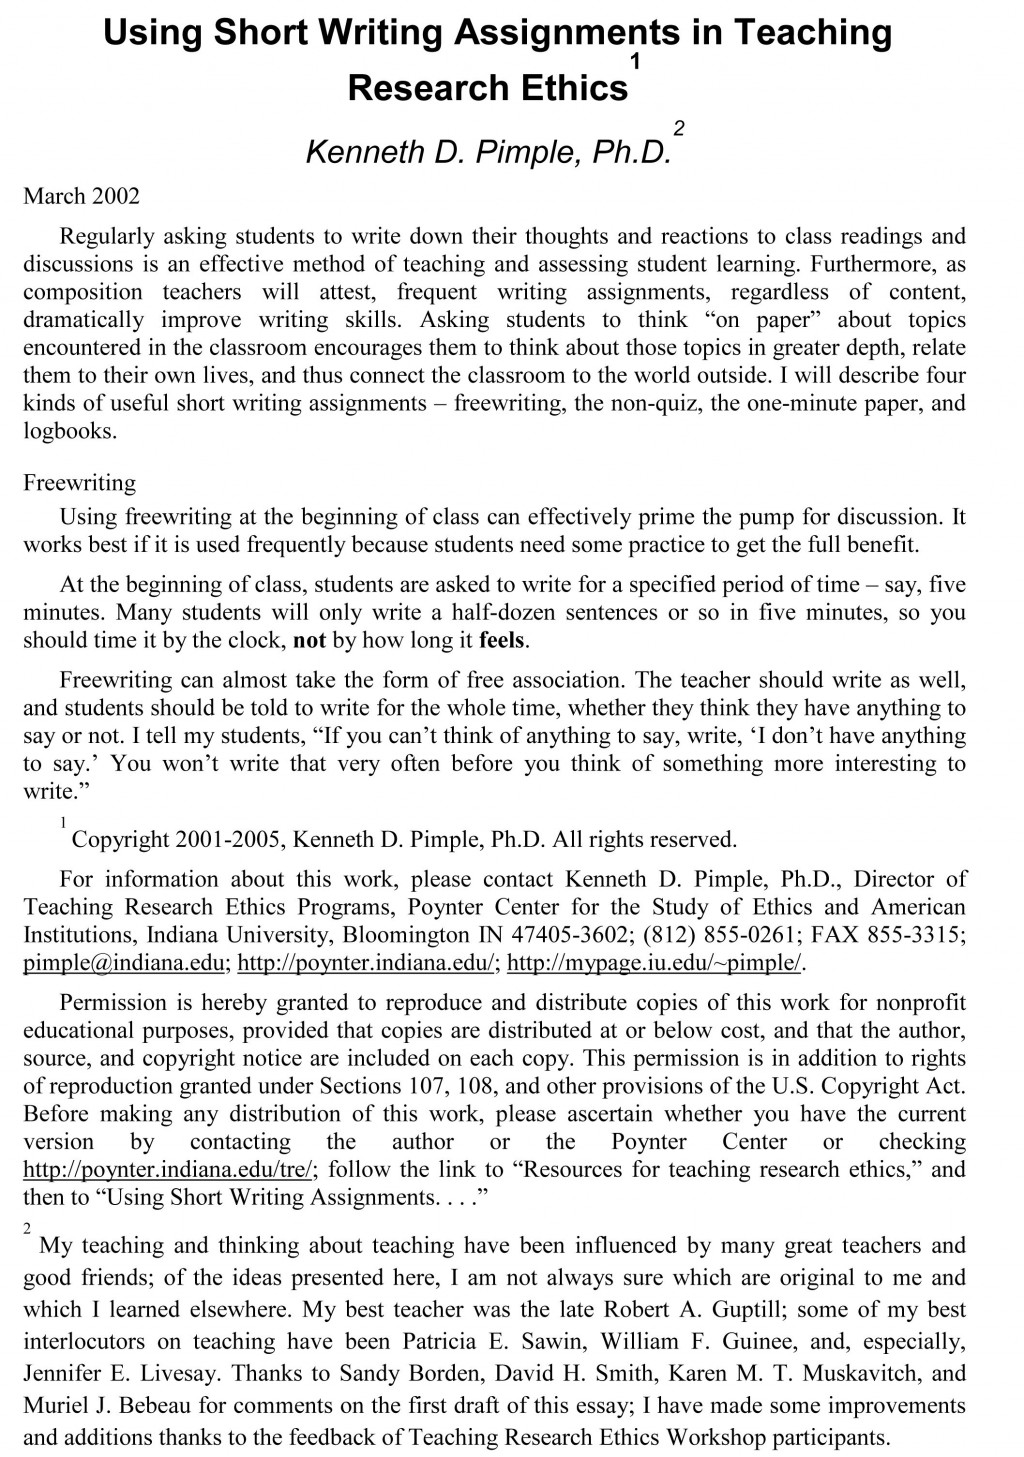 012 Essay Example College Level Argumentative Sample Best Of How To Write Essays Kairo Exceptional Persuasive Examples Topics Large